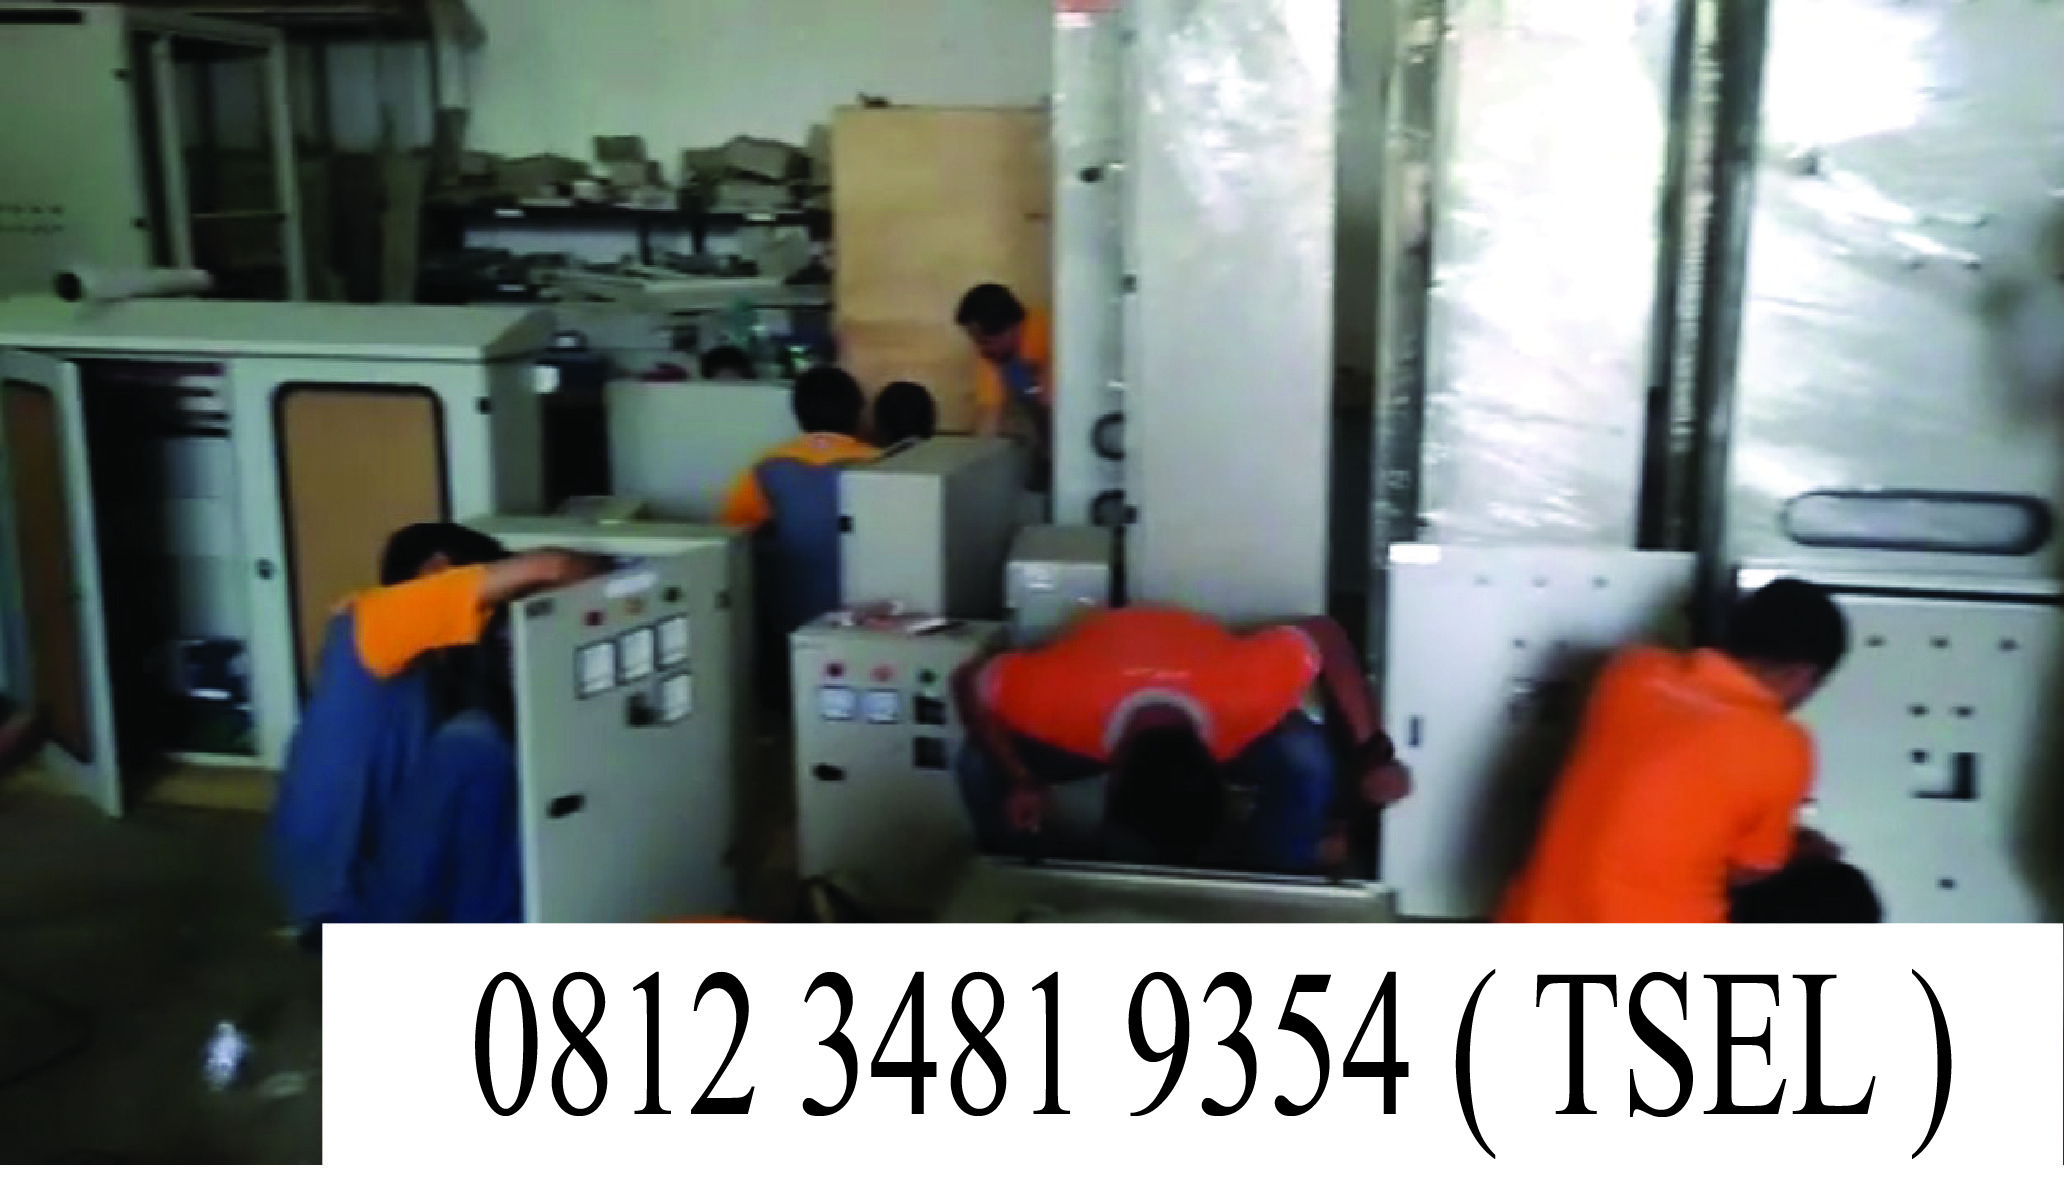 medium resolution of panel mcc mcc control panel manufacturers mcc electrical panel maker mcc panel wiring